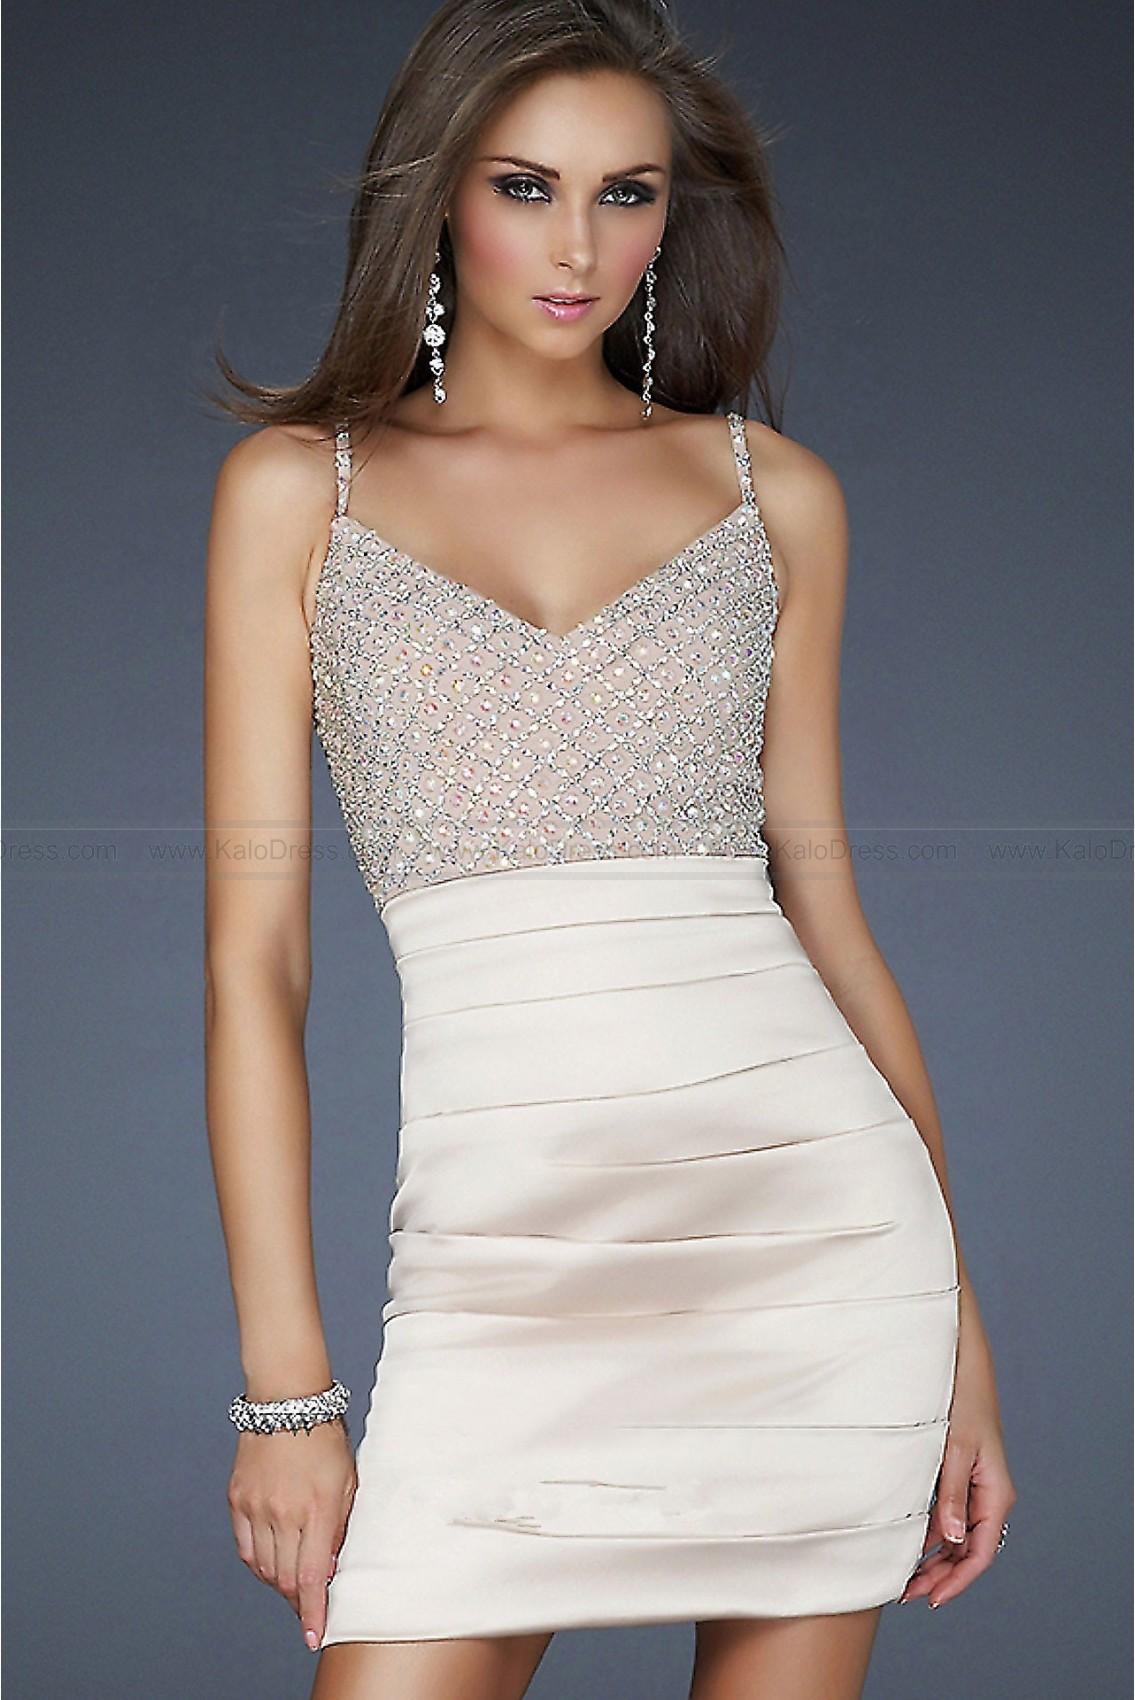 Sheath / Column V-neck Spaghetti Straps Elastic woven satin Prom Dress - Special Occasion